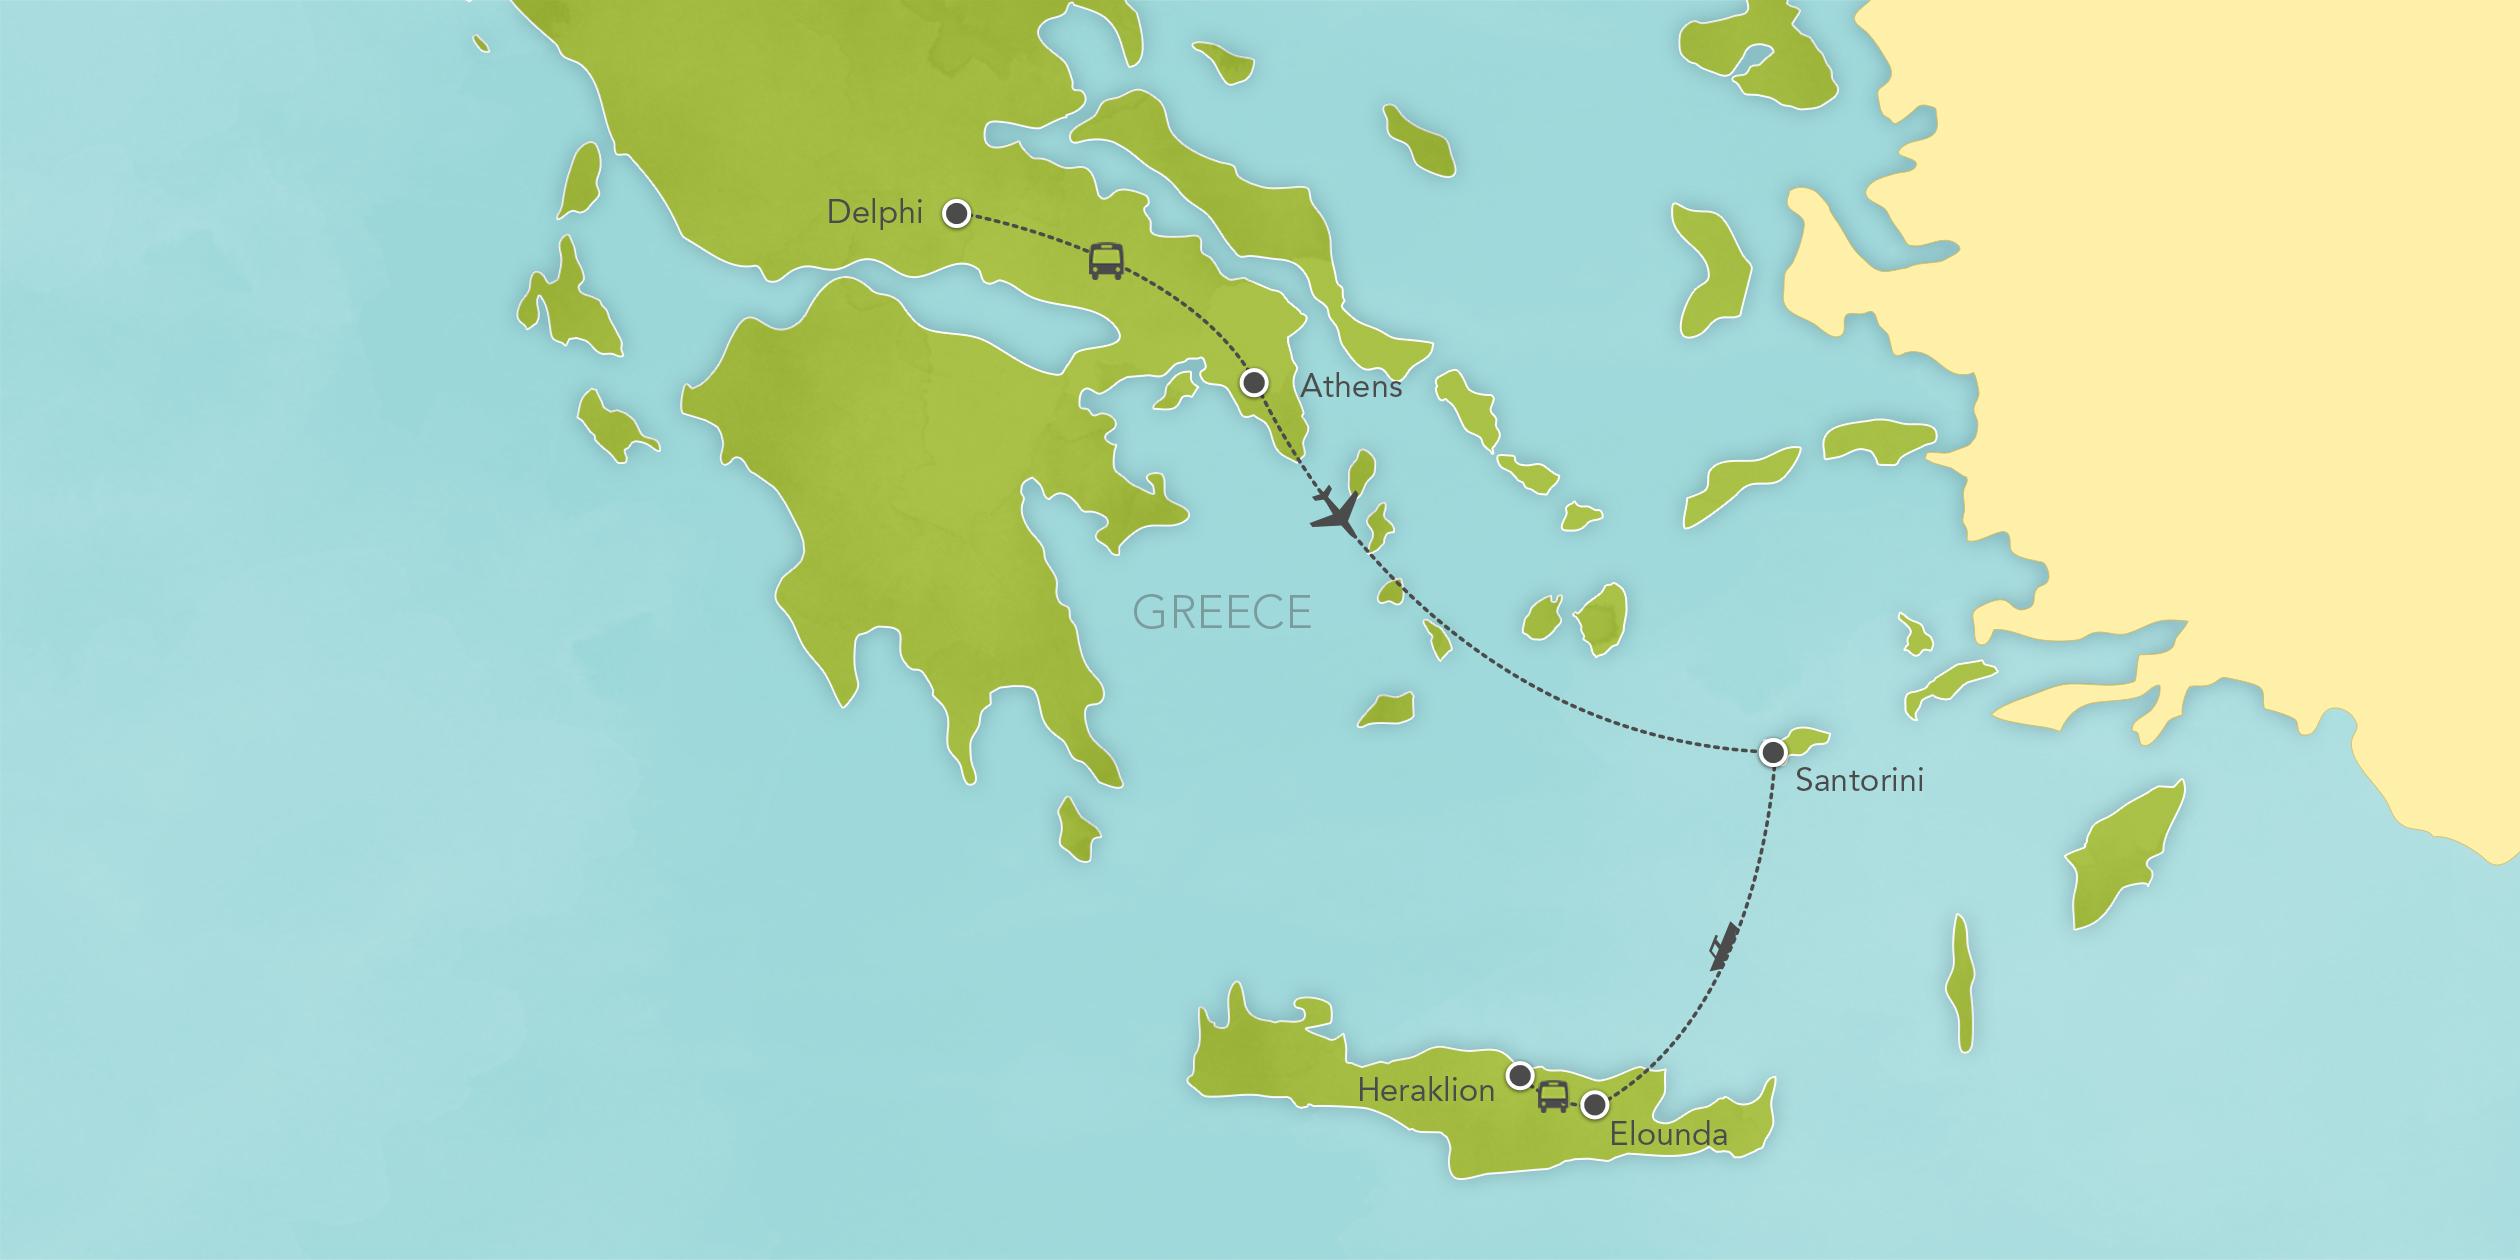 Map for Greece: Athens, Delphi, Santorini, Crete 2019